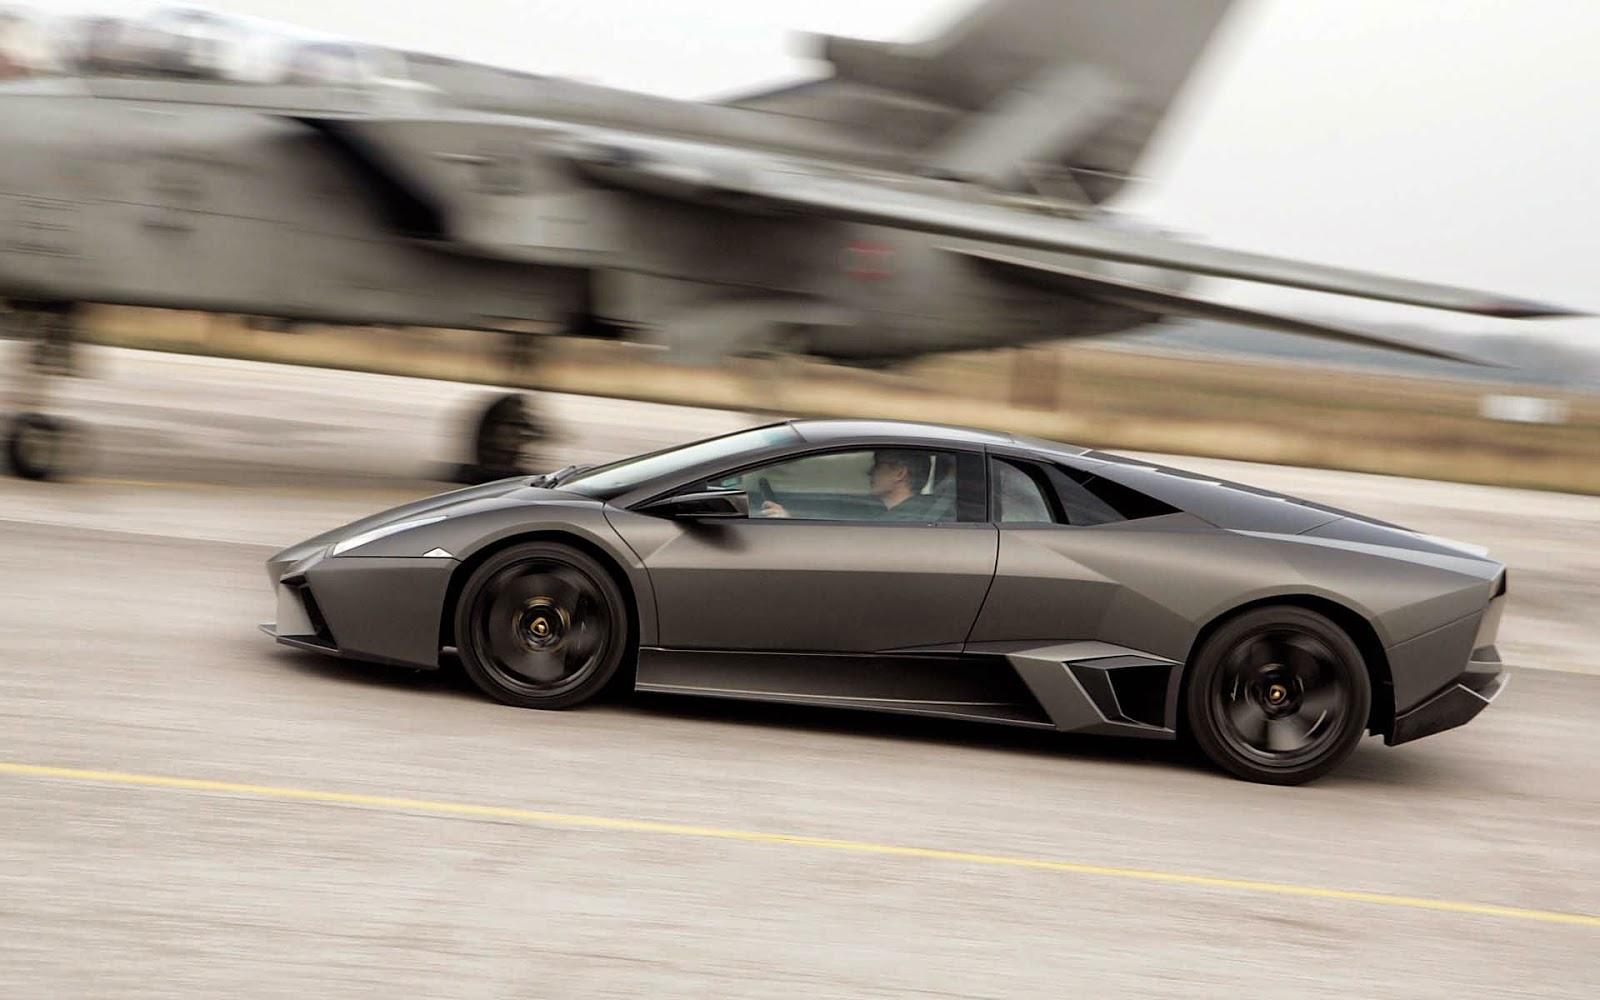 Lamborghini Reventón صور سيارات: لامبورغيني ريفينتون